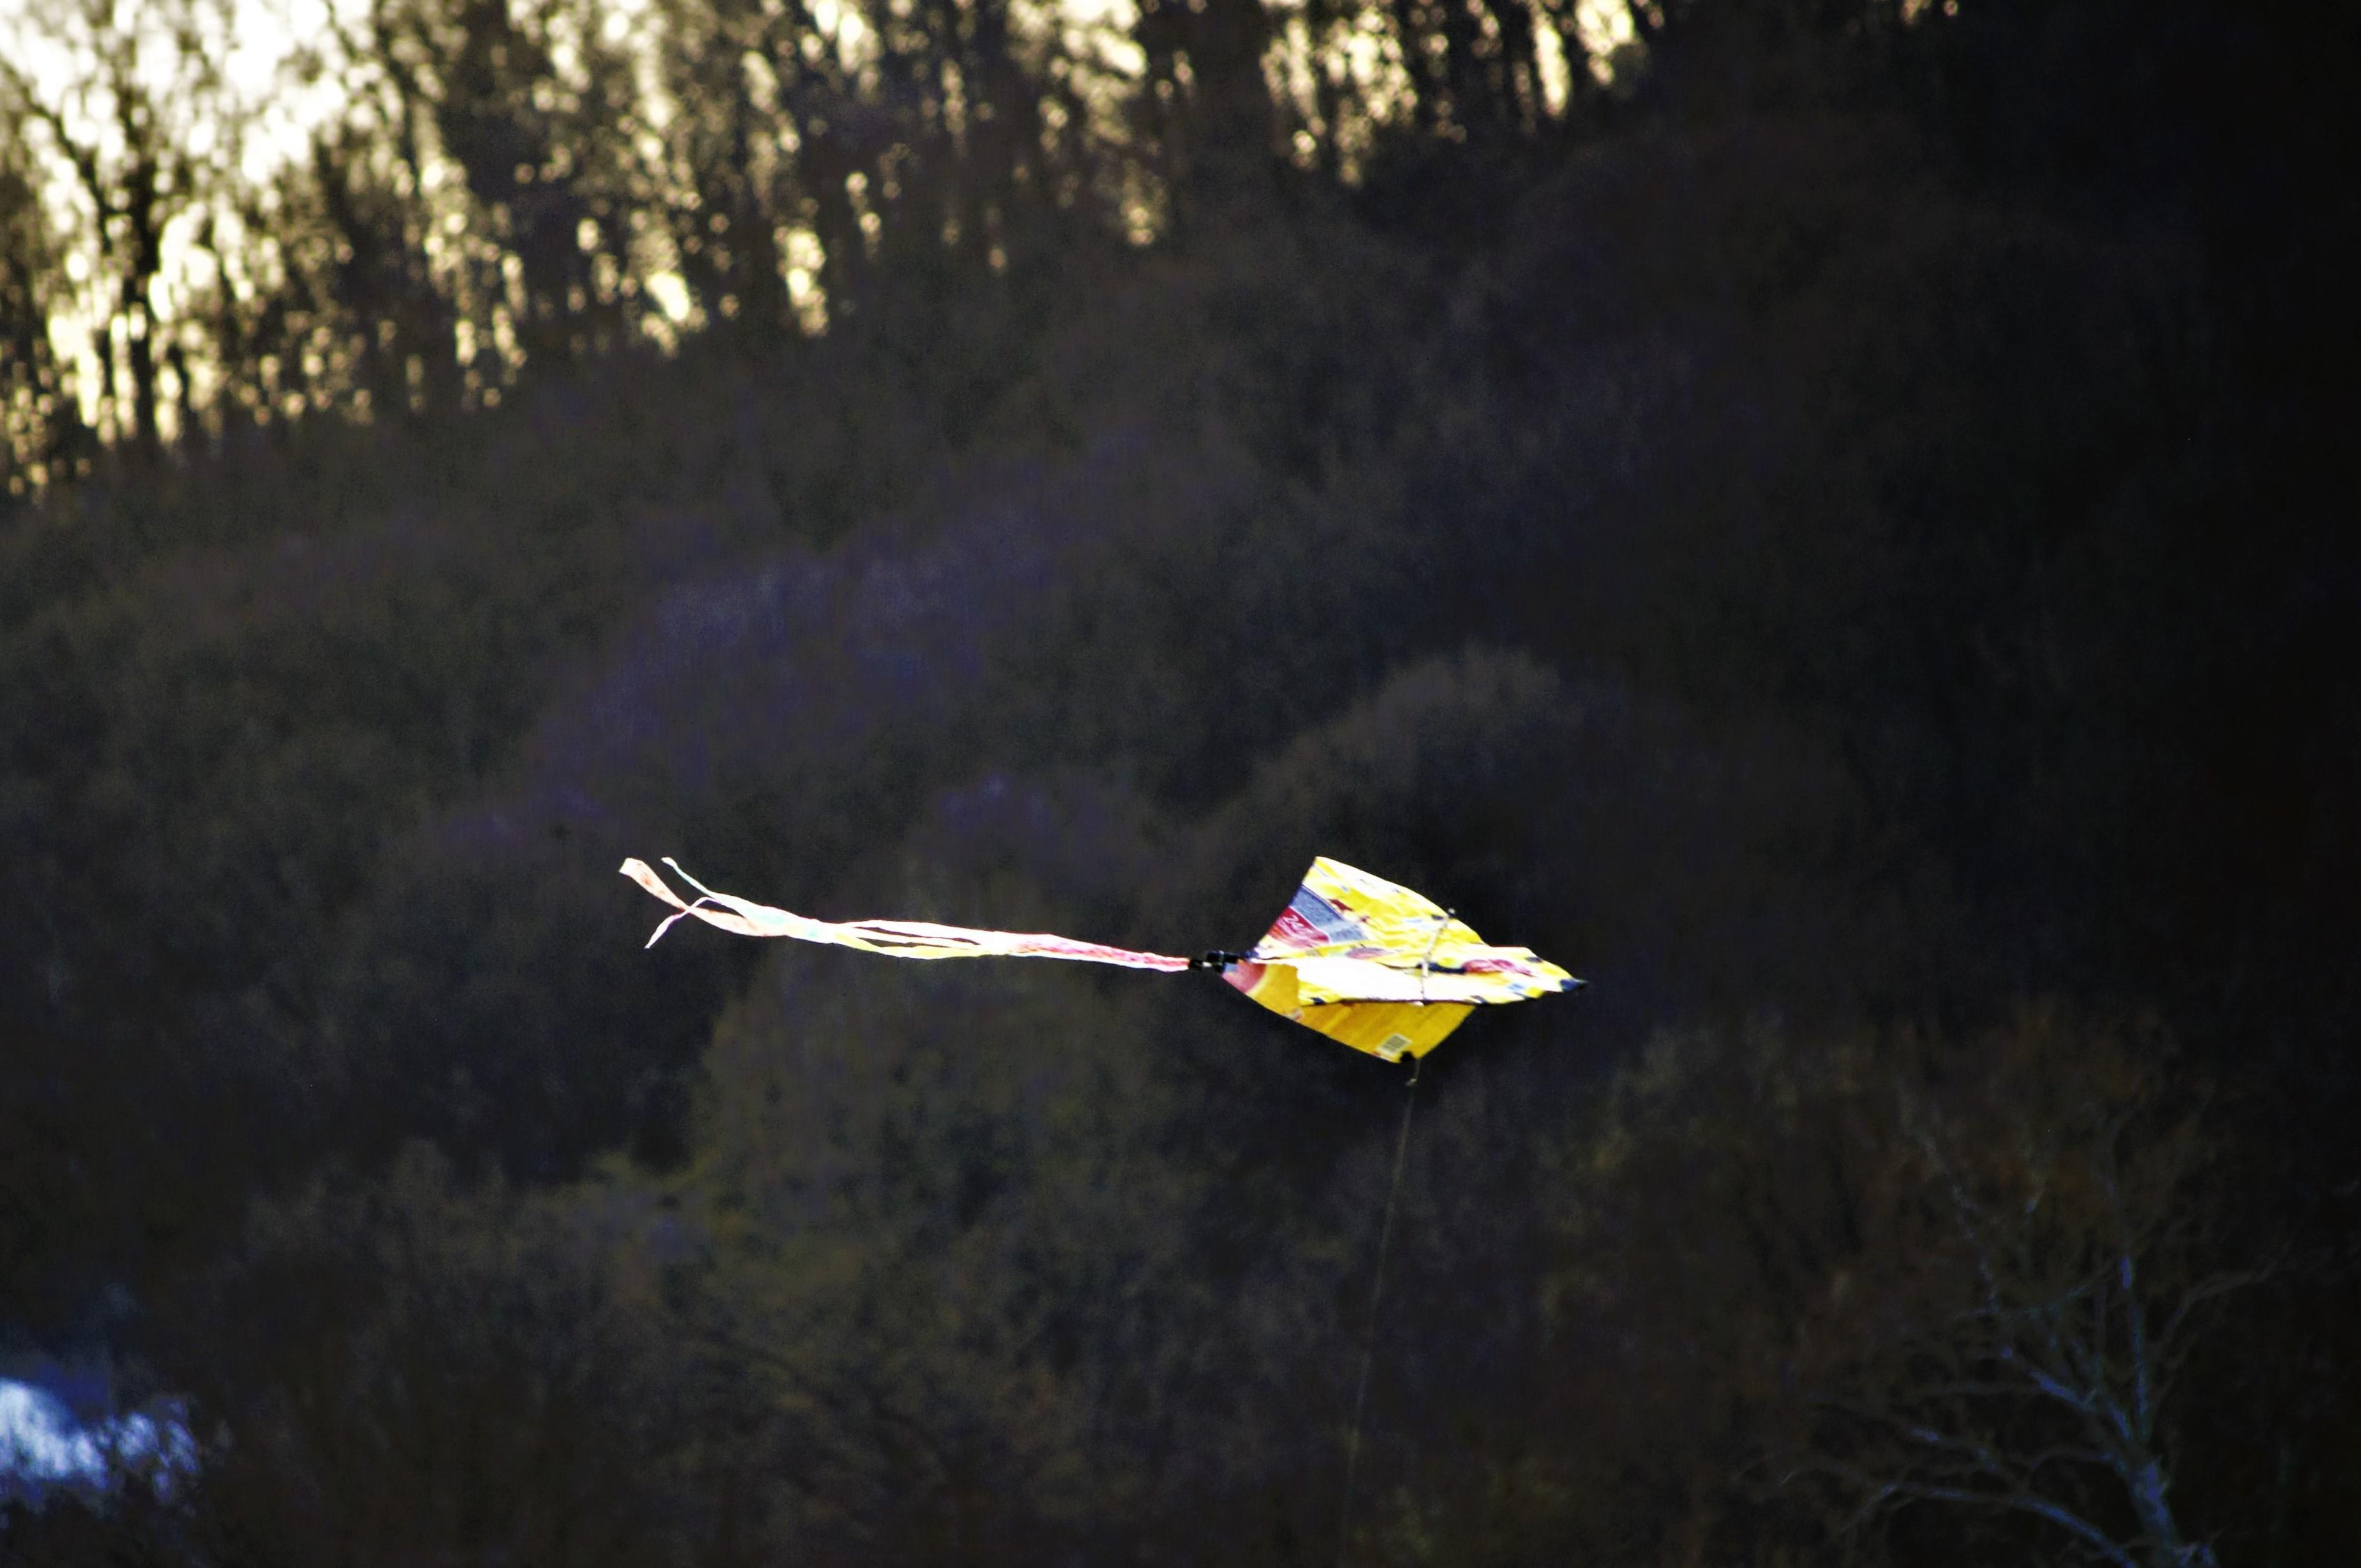 Picture of Kitty-Litter Delta  -  DIY Kite